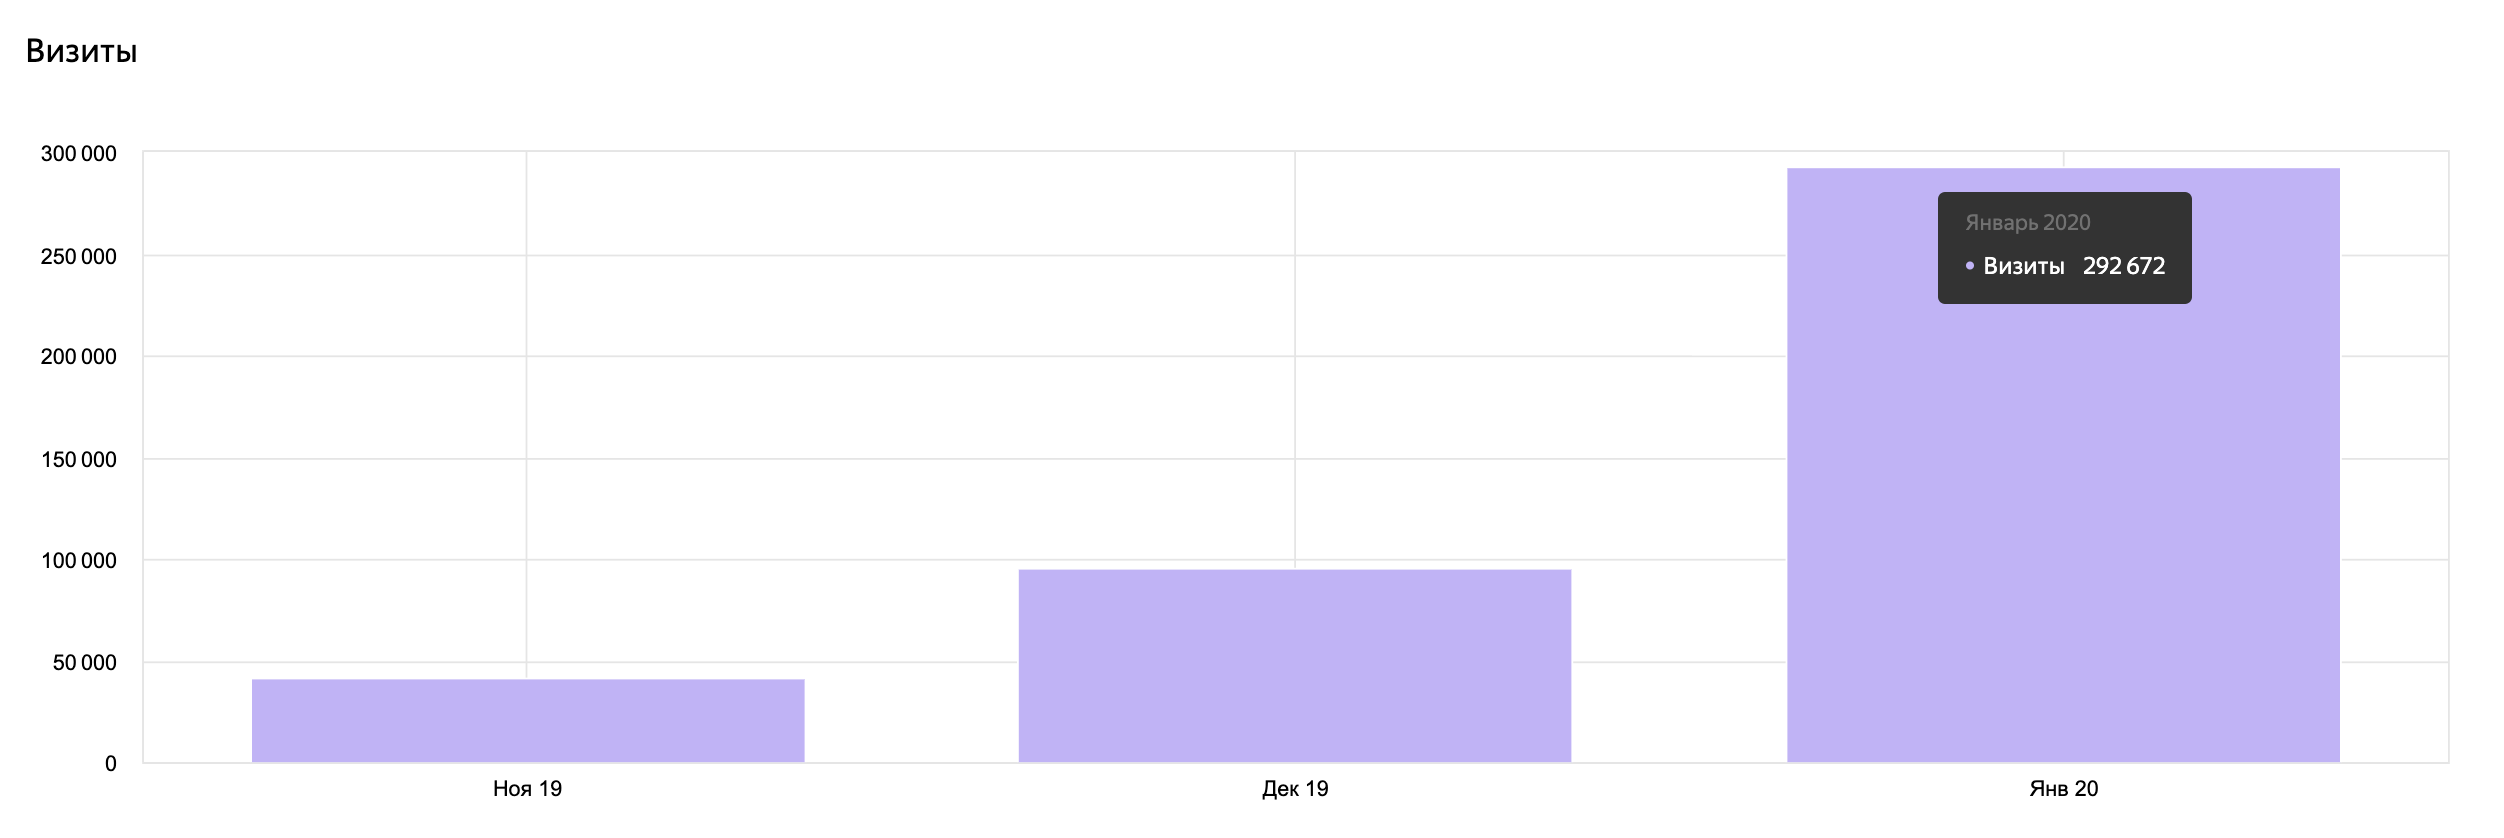 Рост трафика по месяцам